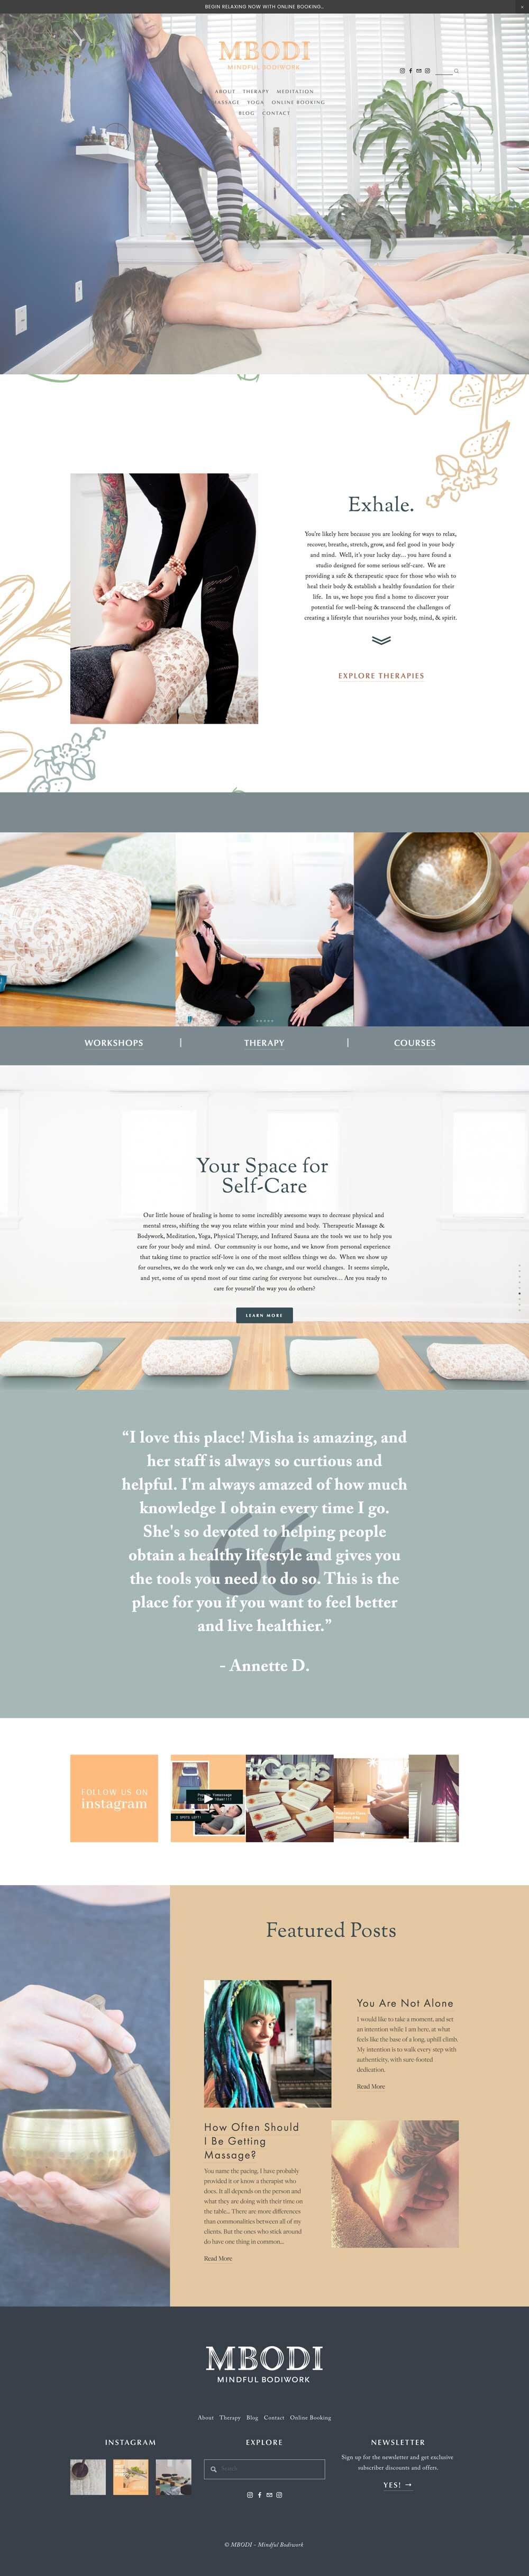 Big-Cat-Creative-Squarespace-Website-Template-Kits-Sophie-Showcase-11.jpg